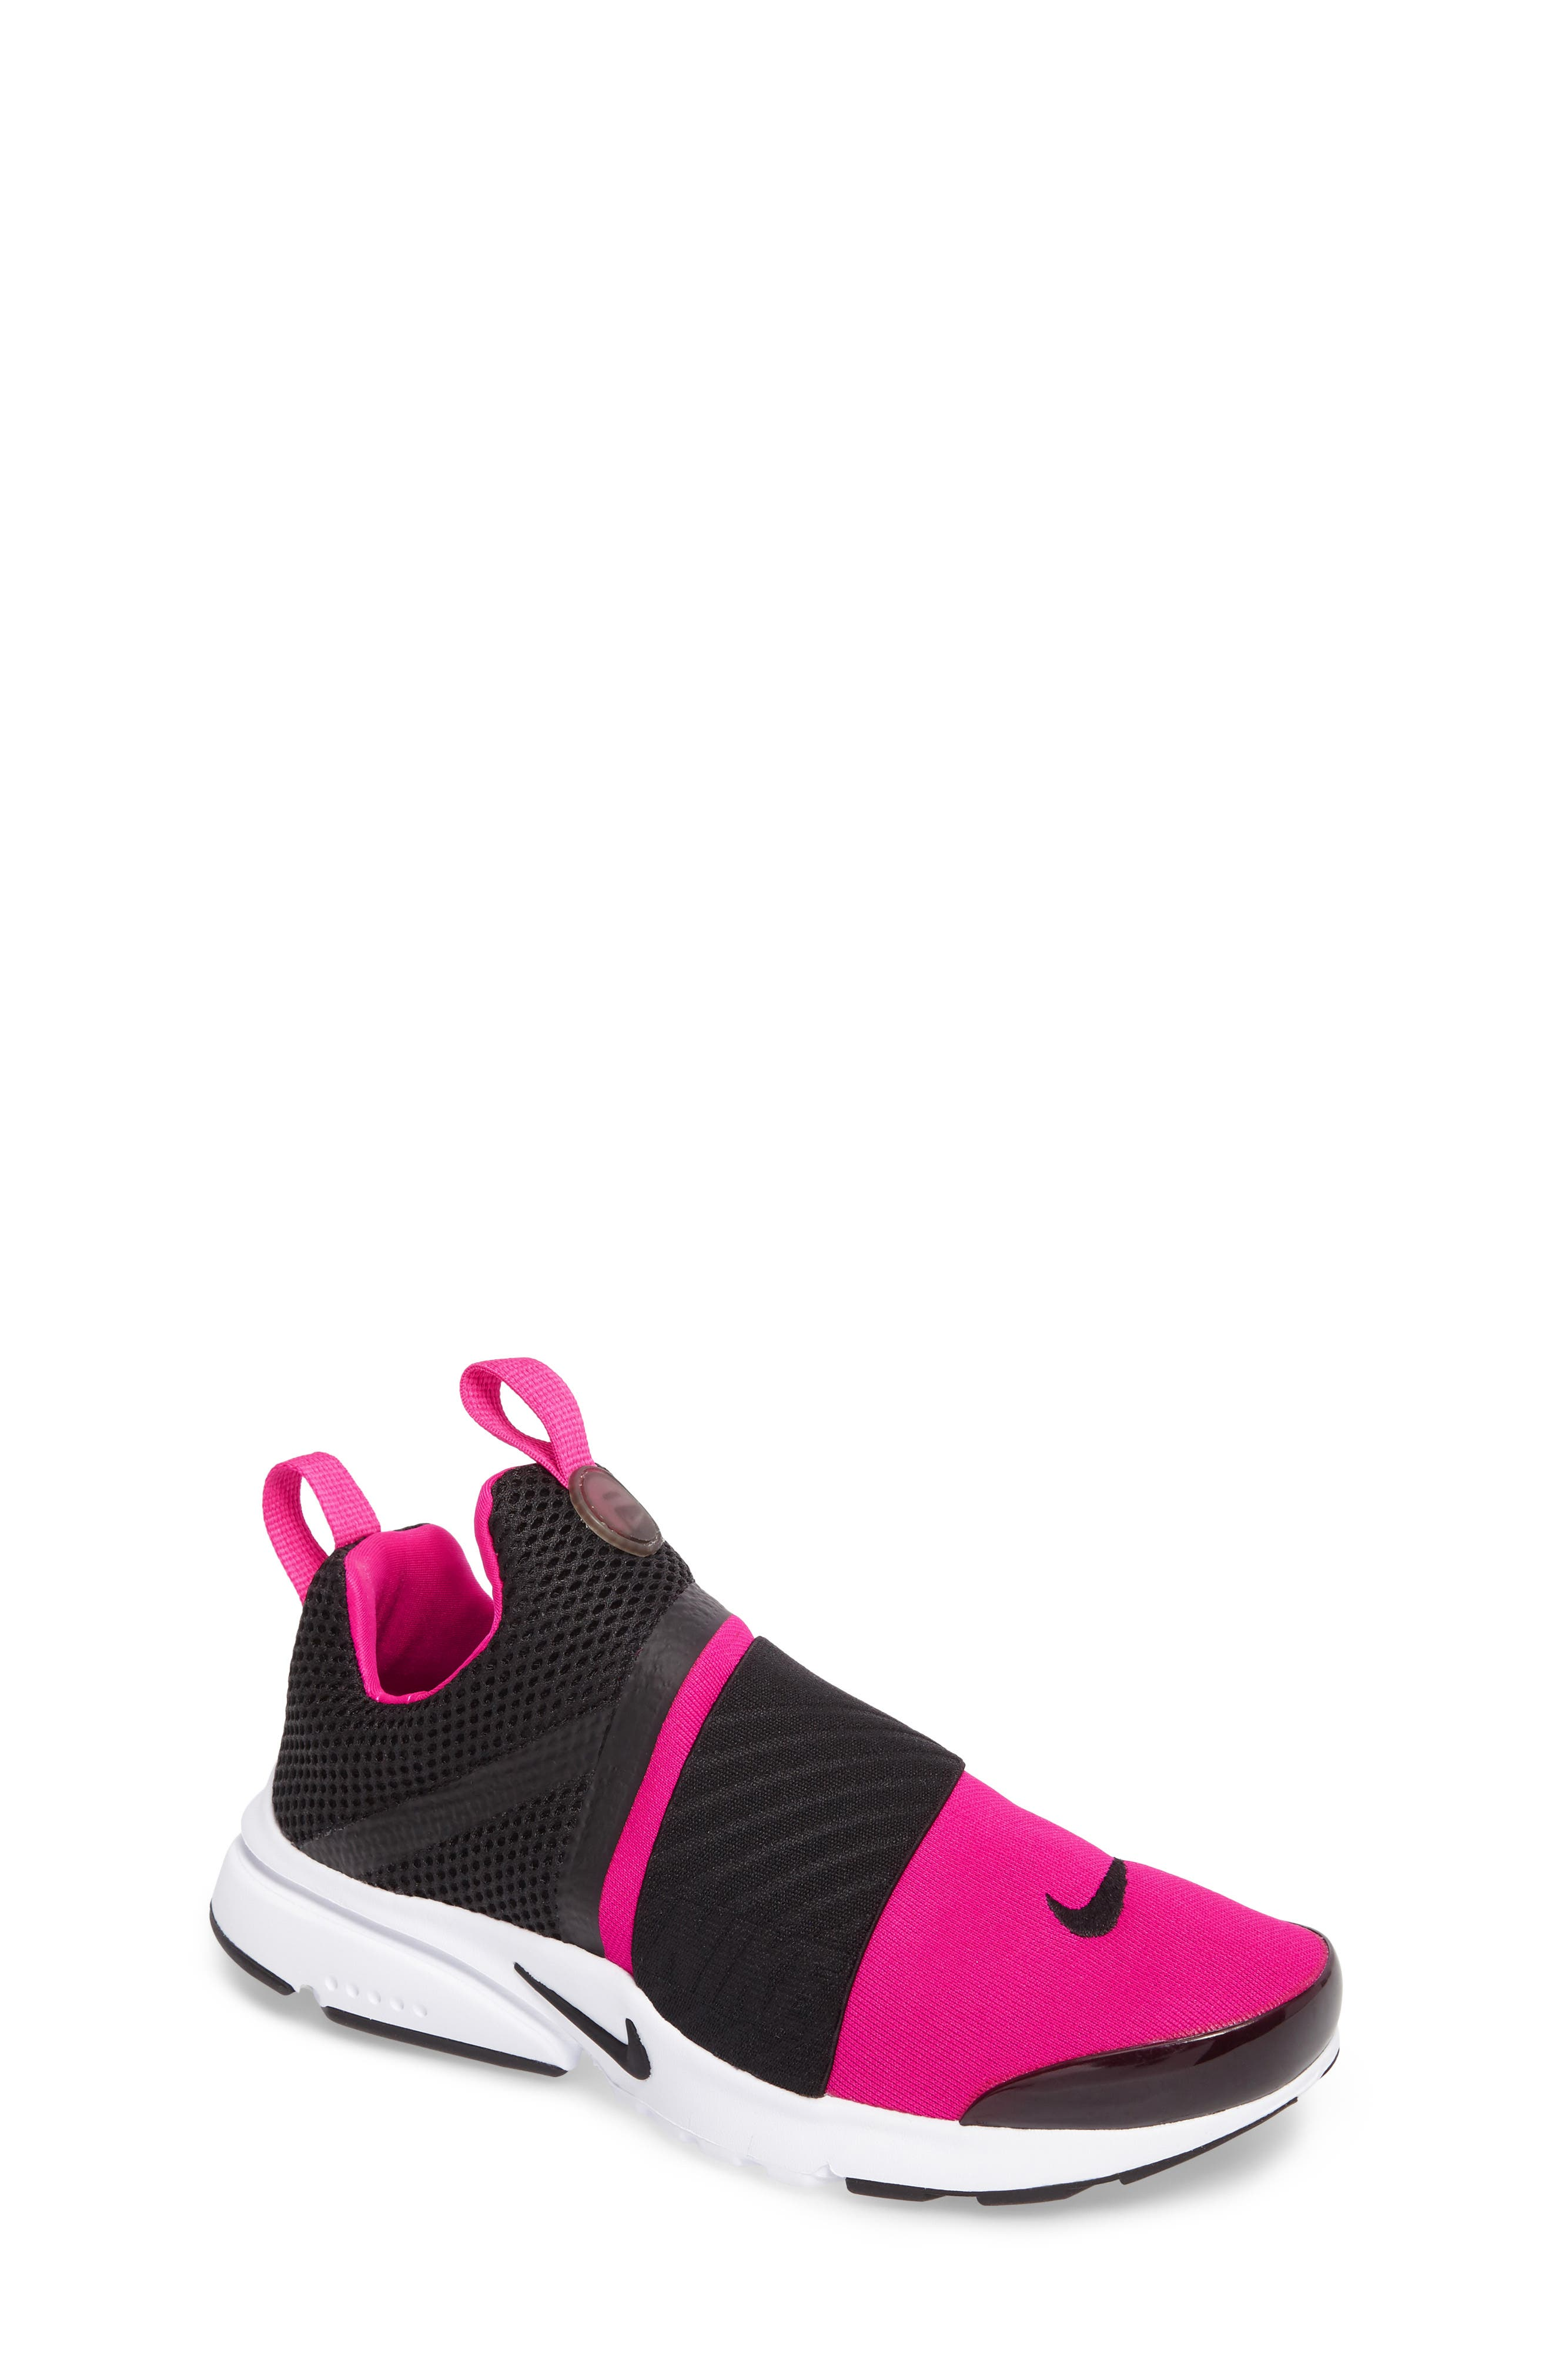 Nike Presto Extreme Sneaker (Baby, Walker, Toddler, Little Kid & Big Kid)